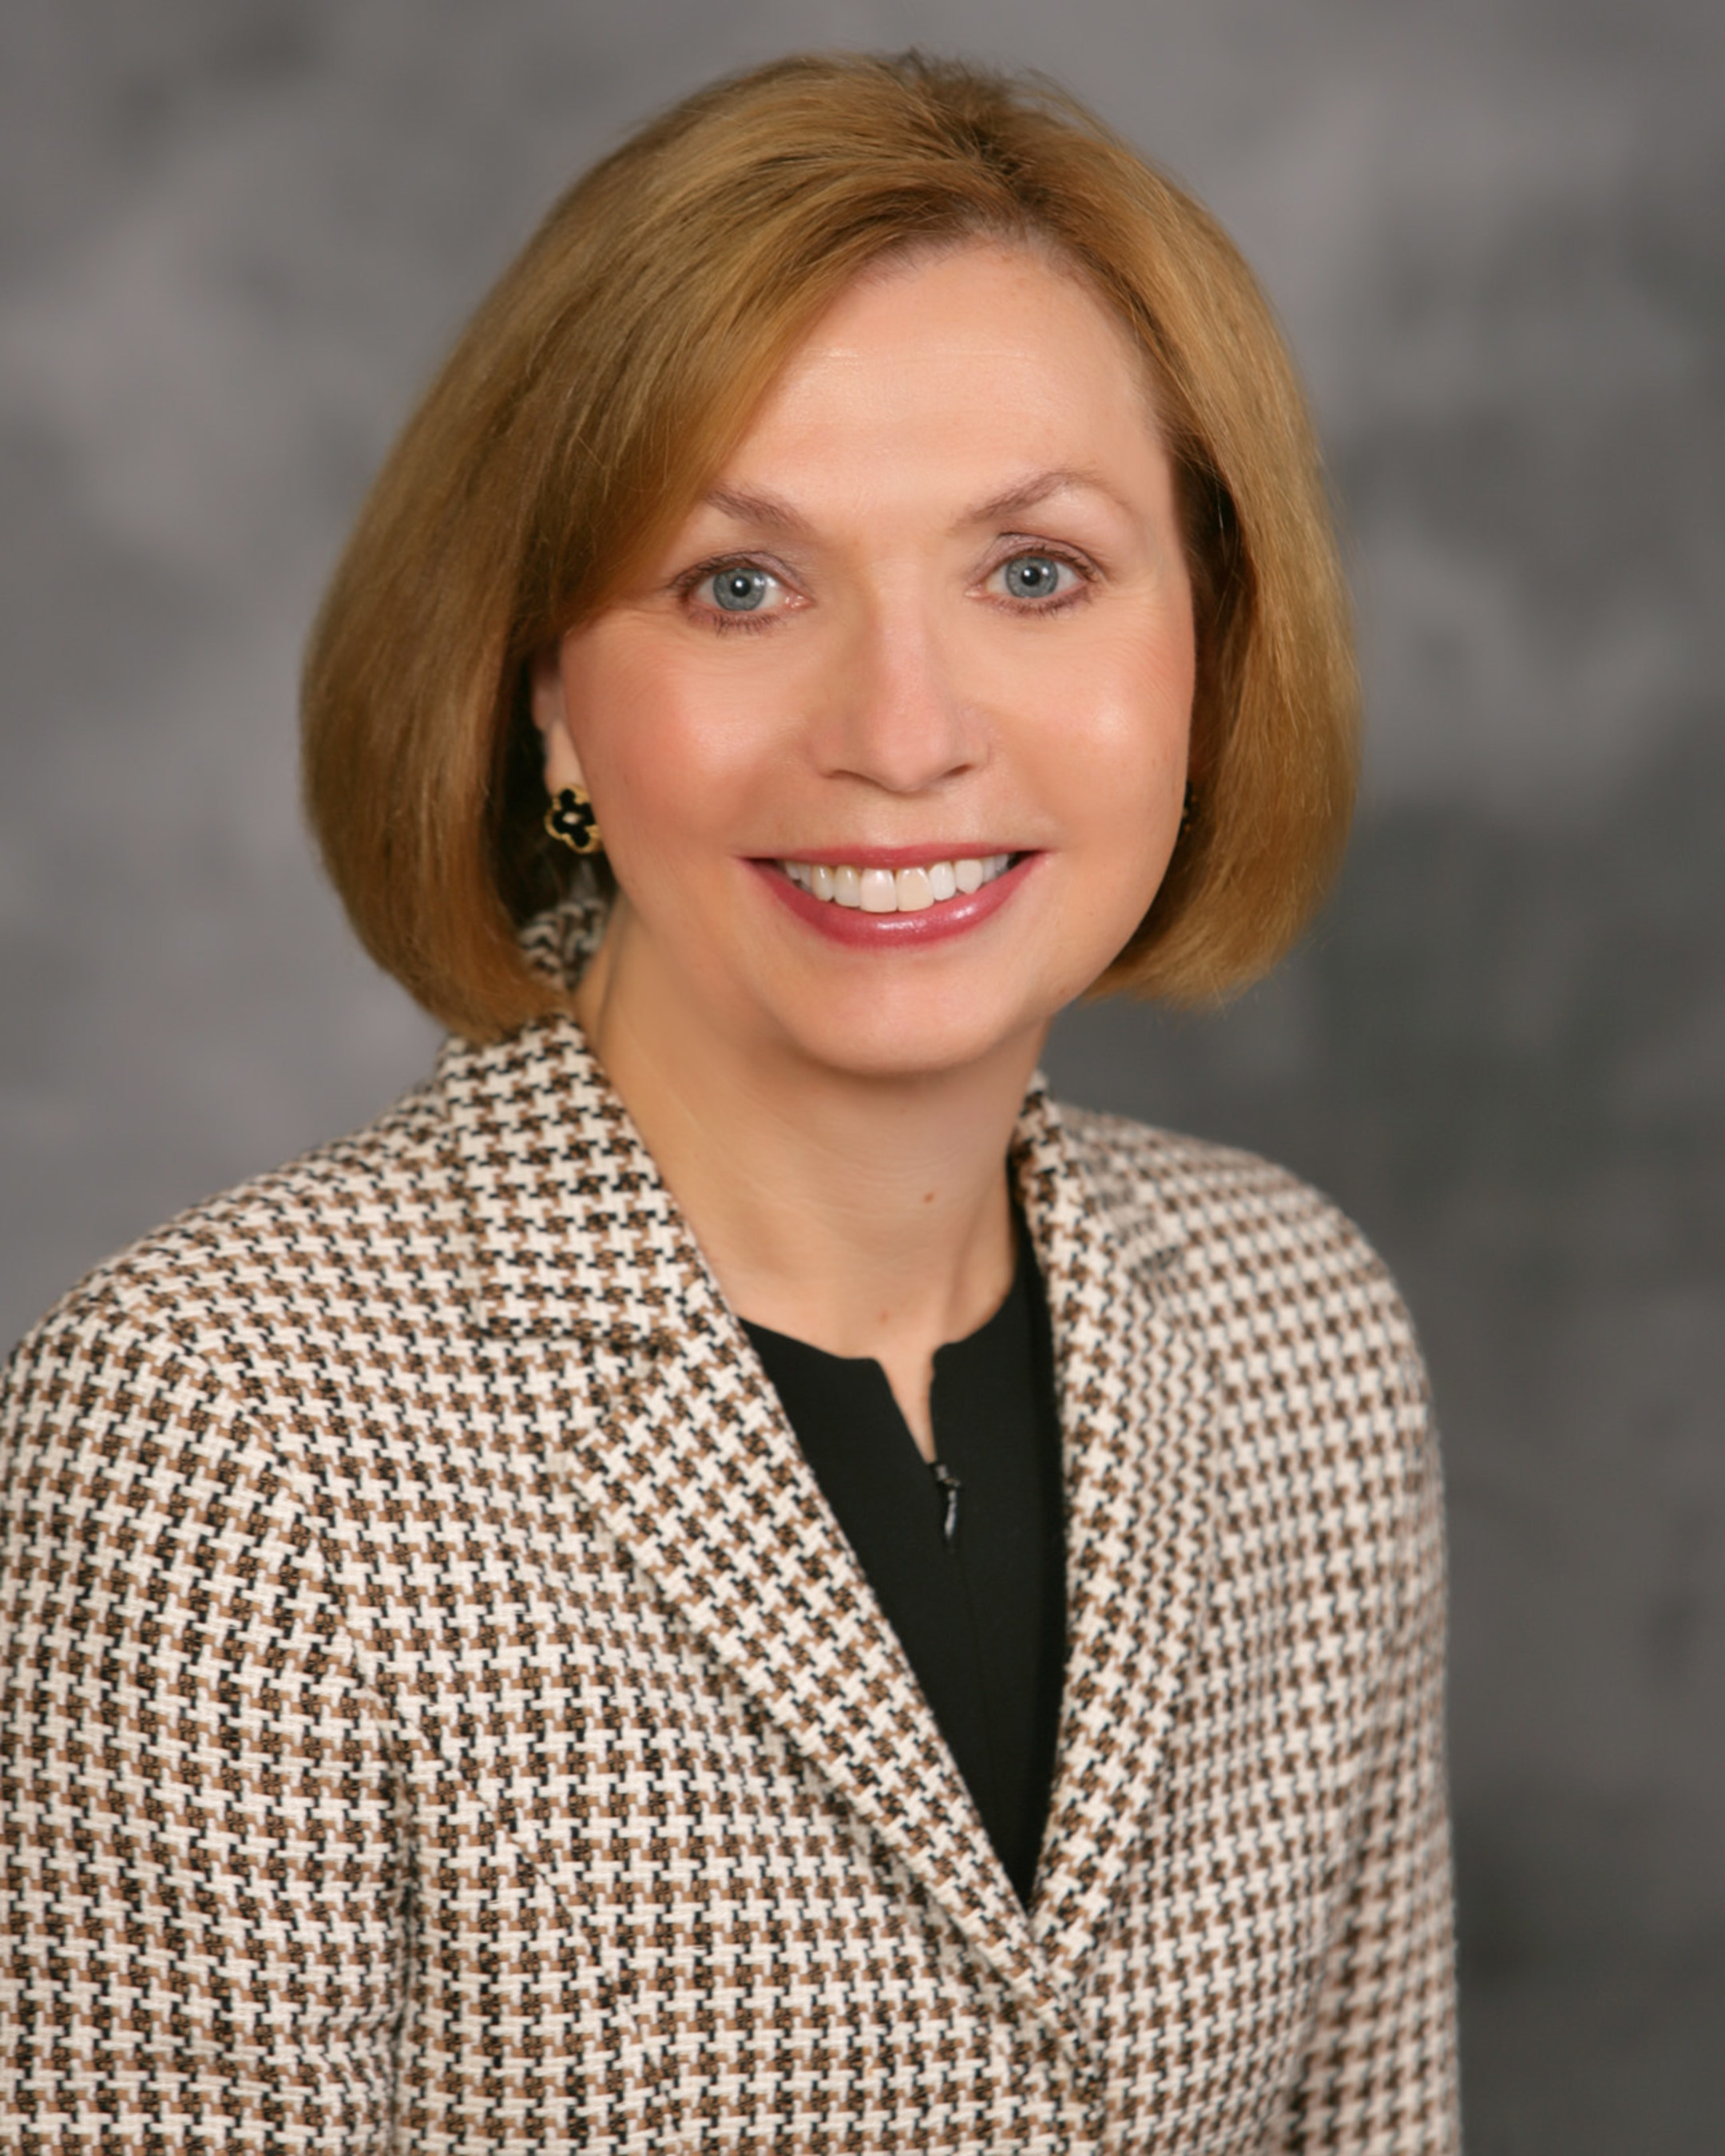 Elaine Sarsynski, Executive Vice President, MassMutual Retirement Services & Worksite Insurance